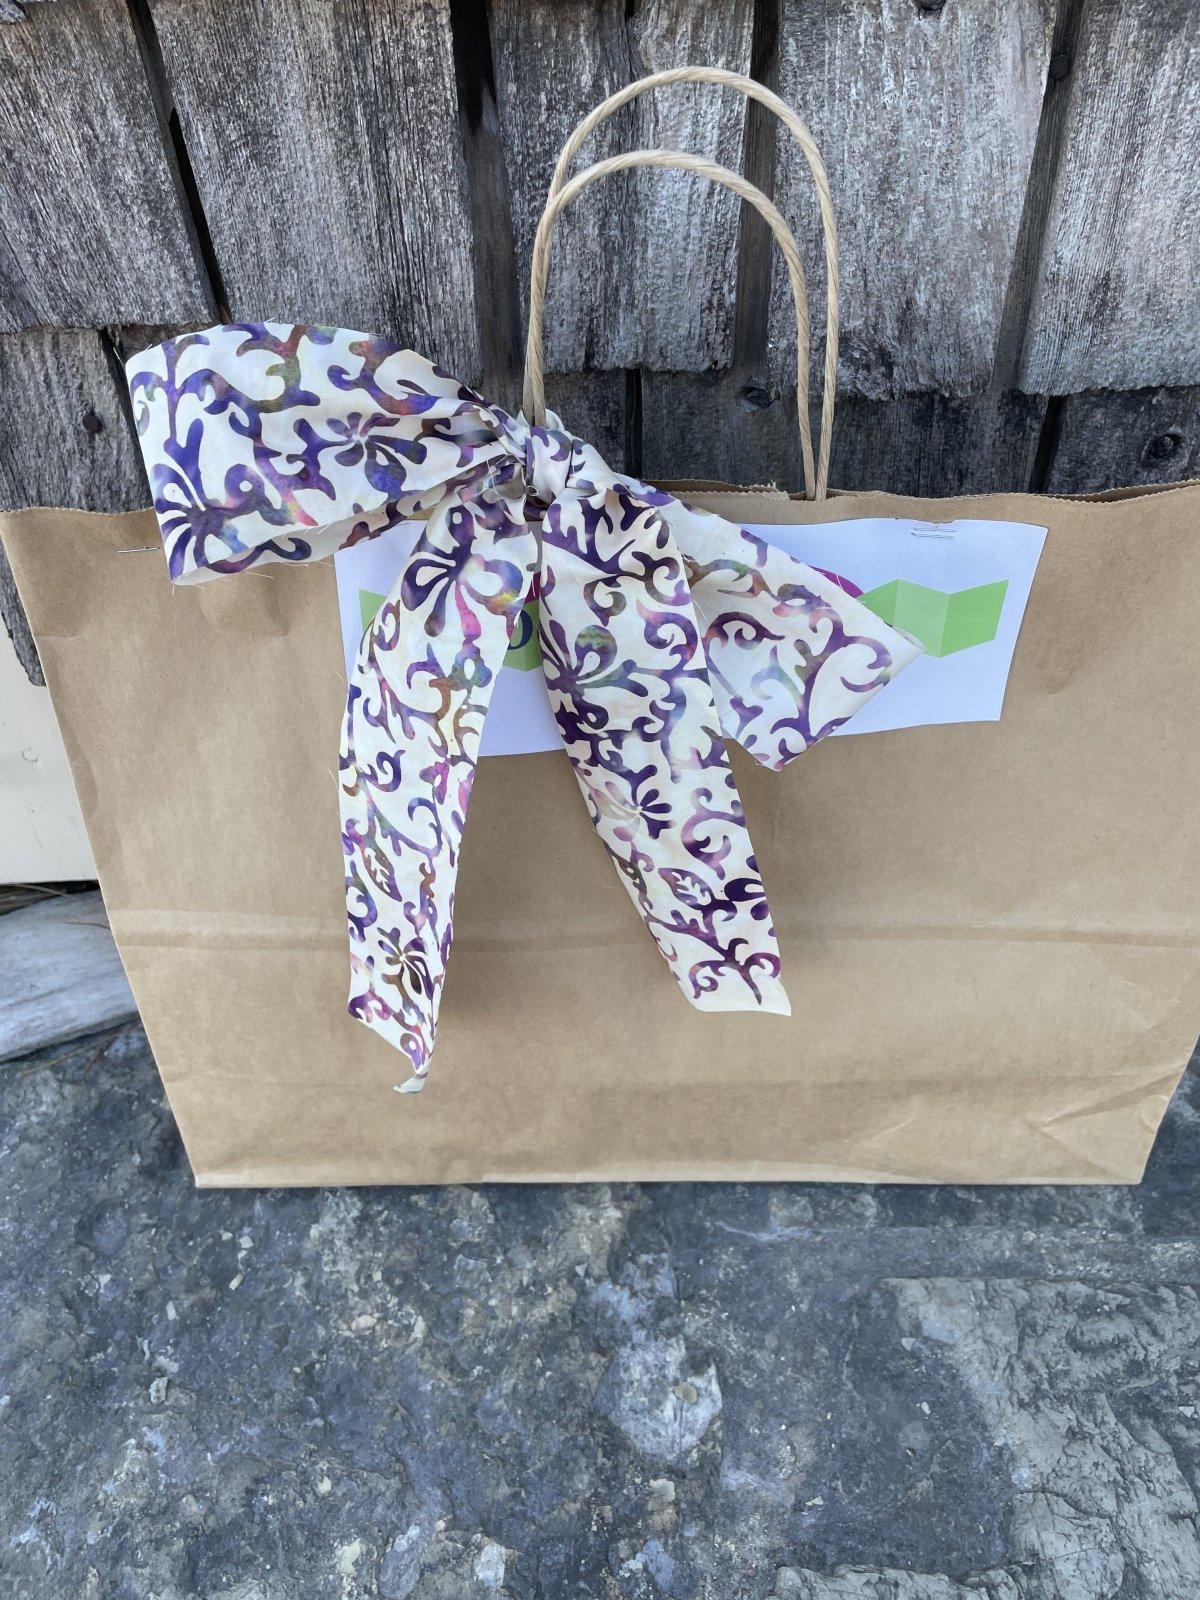 Double the Fun Mystery Quilt: Batik